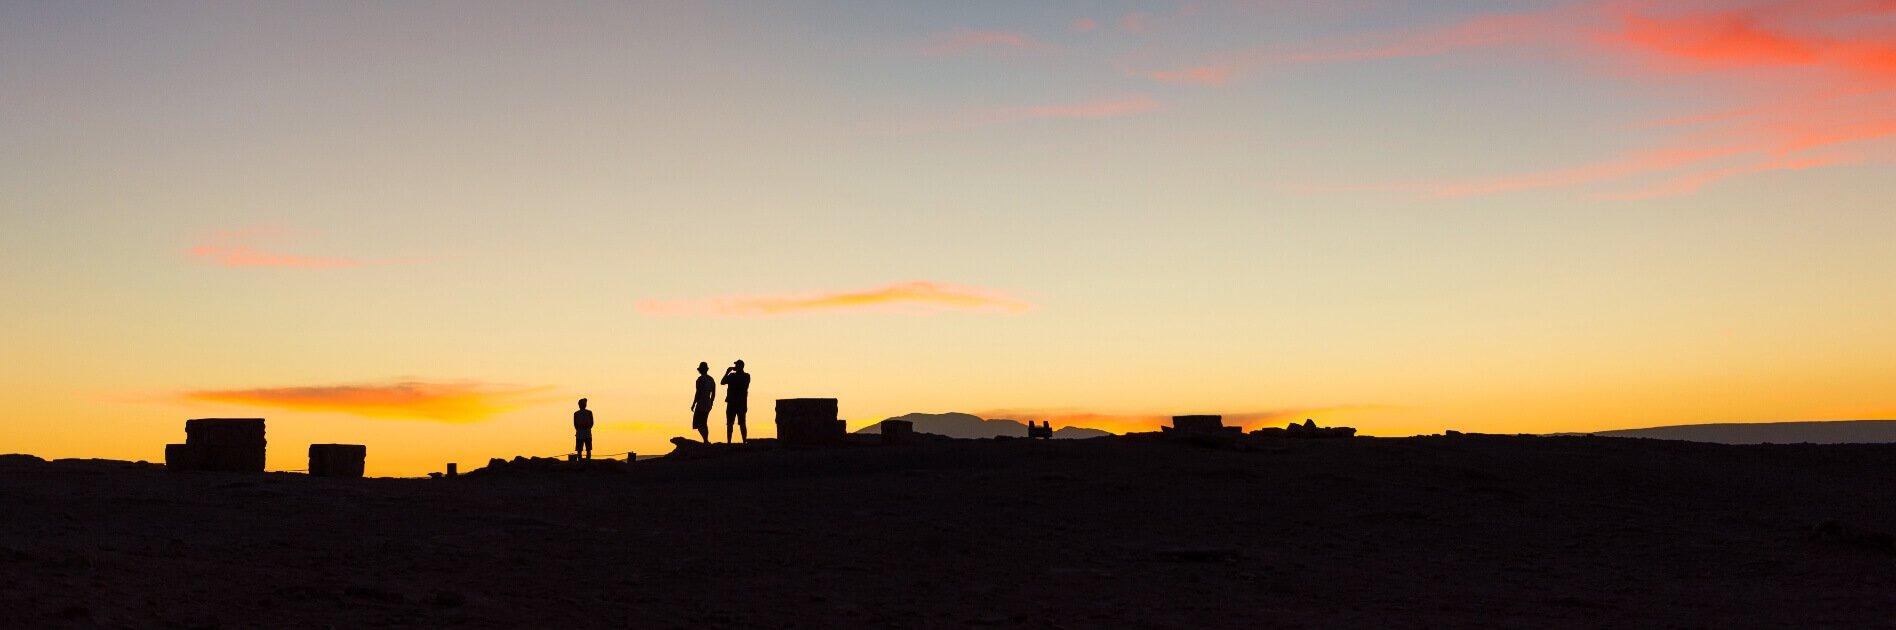 Mastro Patagonico – Slide Home promo Cile-atacama-paine